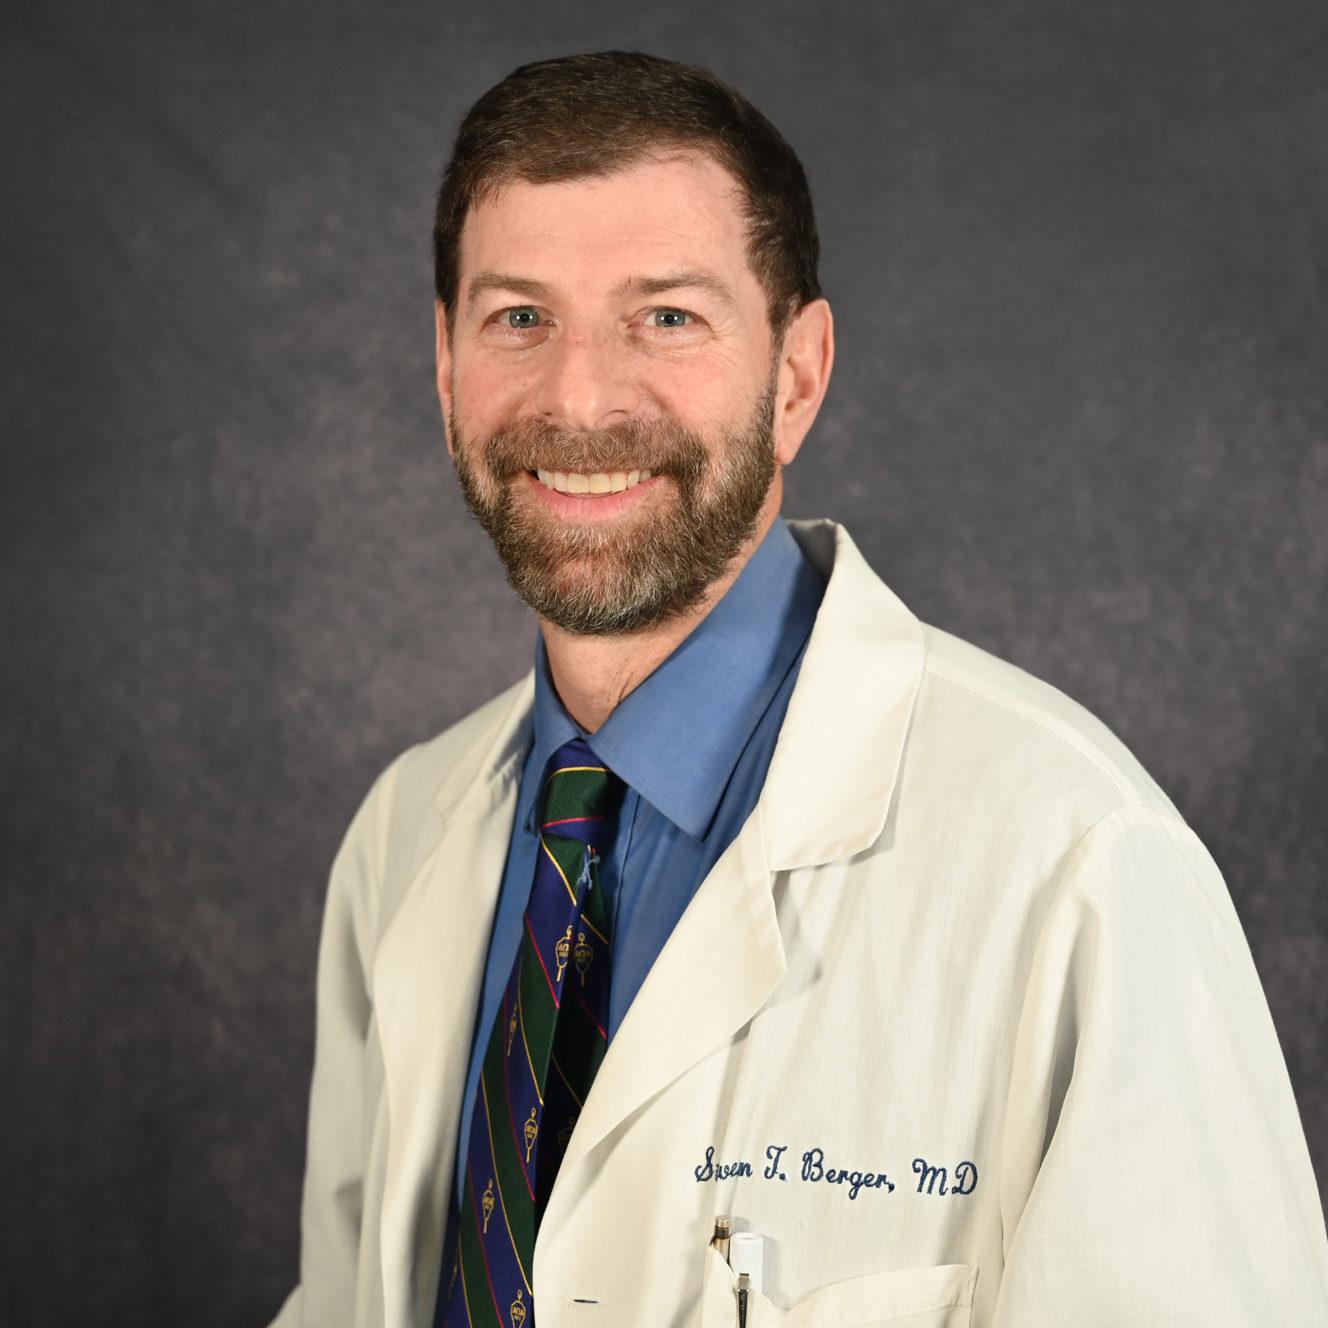 Dr-Steven-Berger